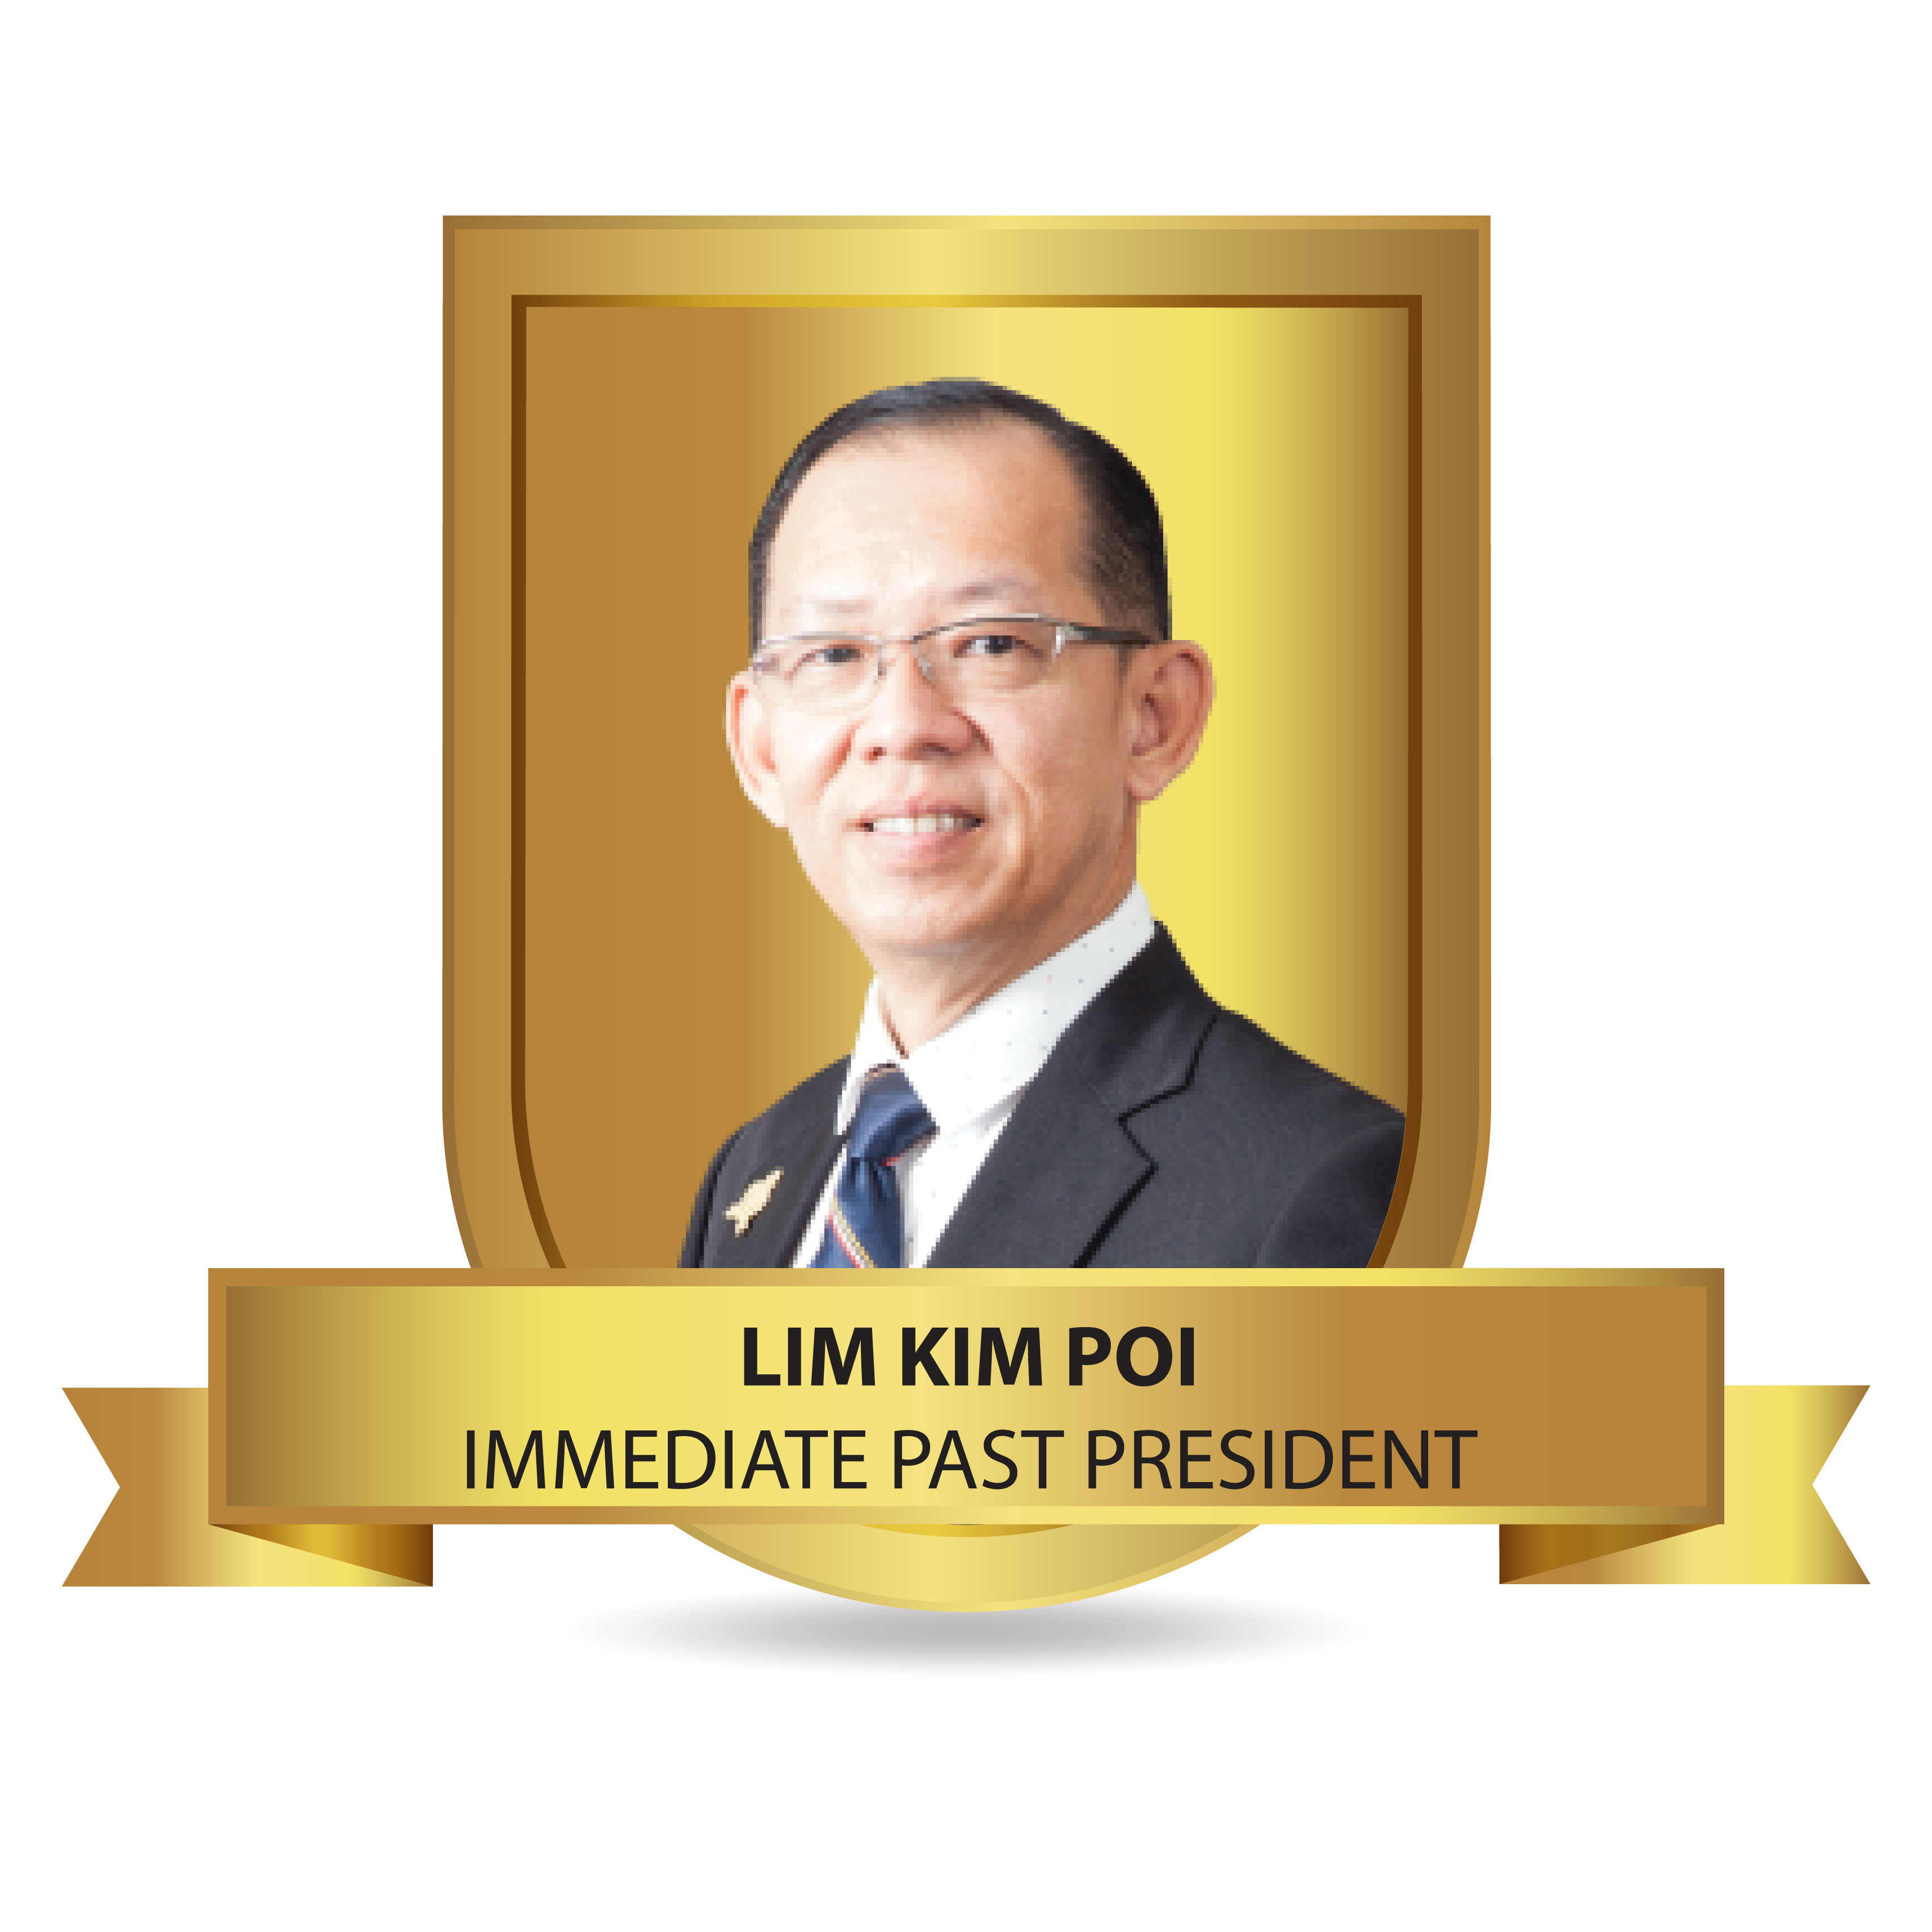 lim-kim-poi-01